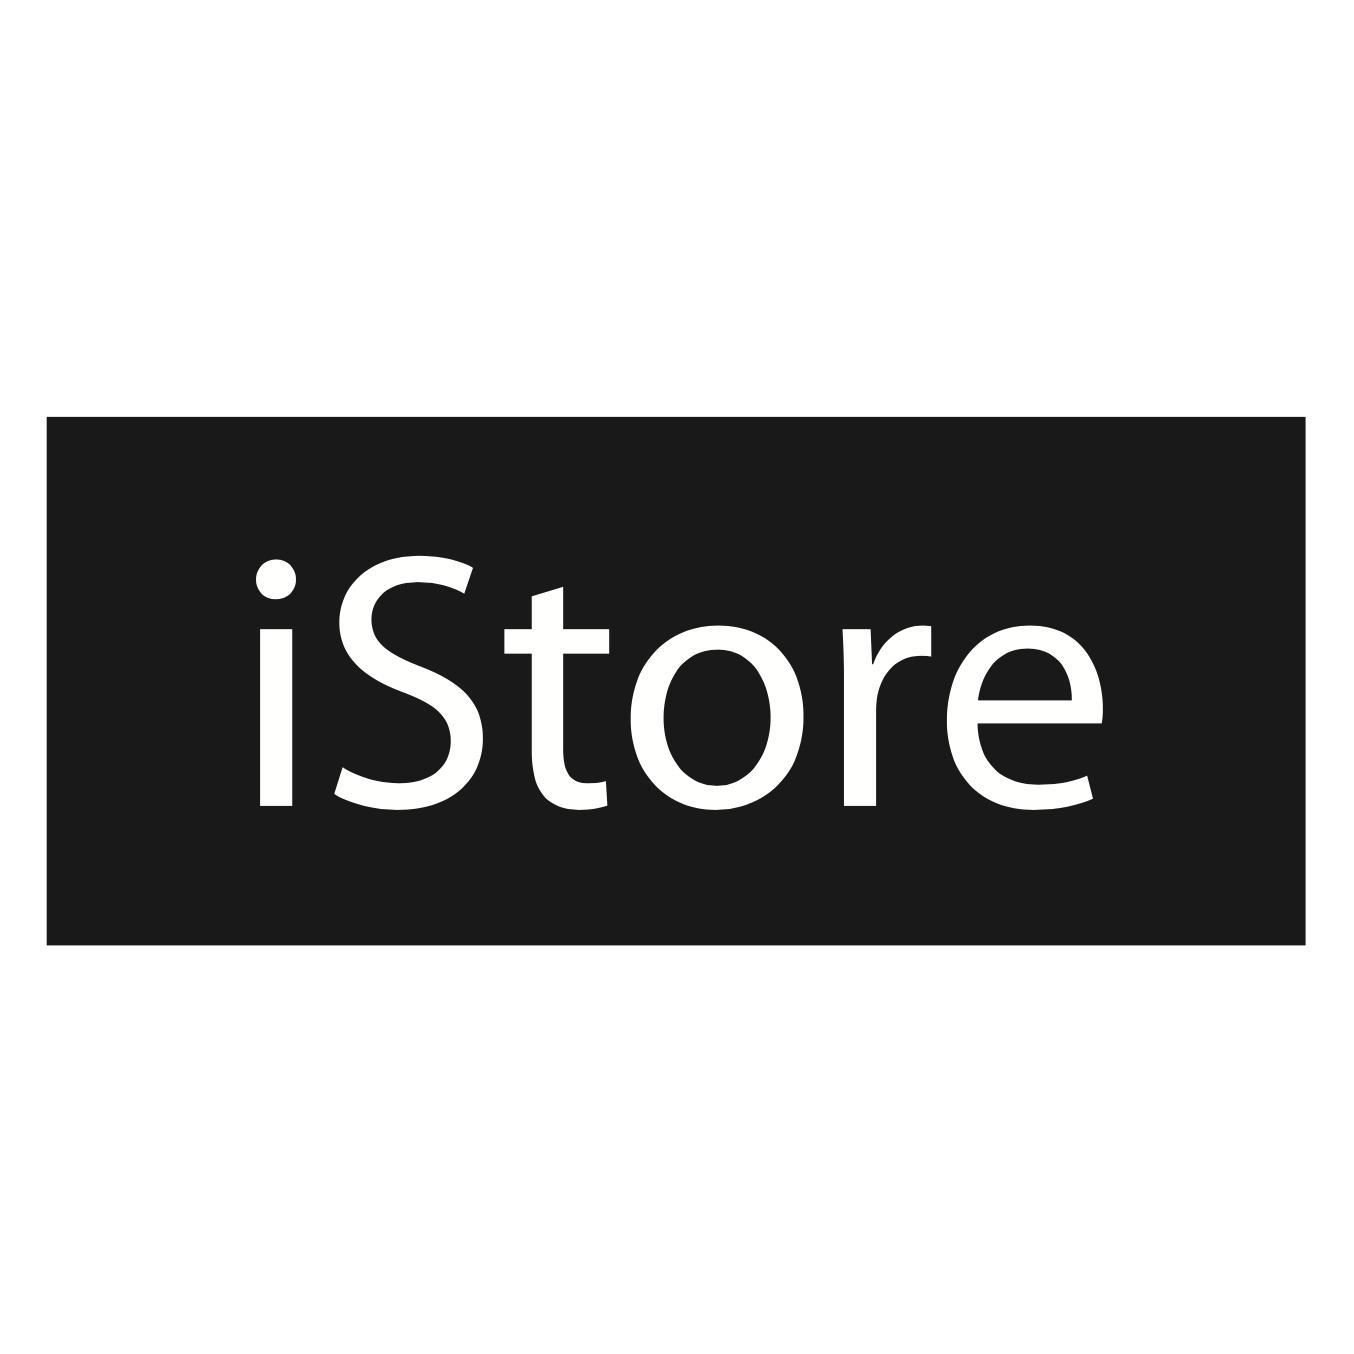 Kate Spade New York Wrap Case for iPhone 8/7 - Glitter Stripe Black Saffiano Silver